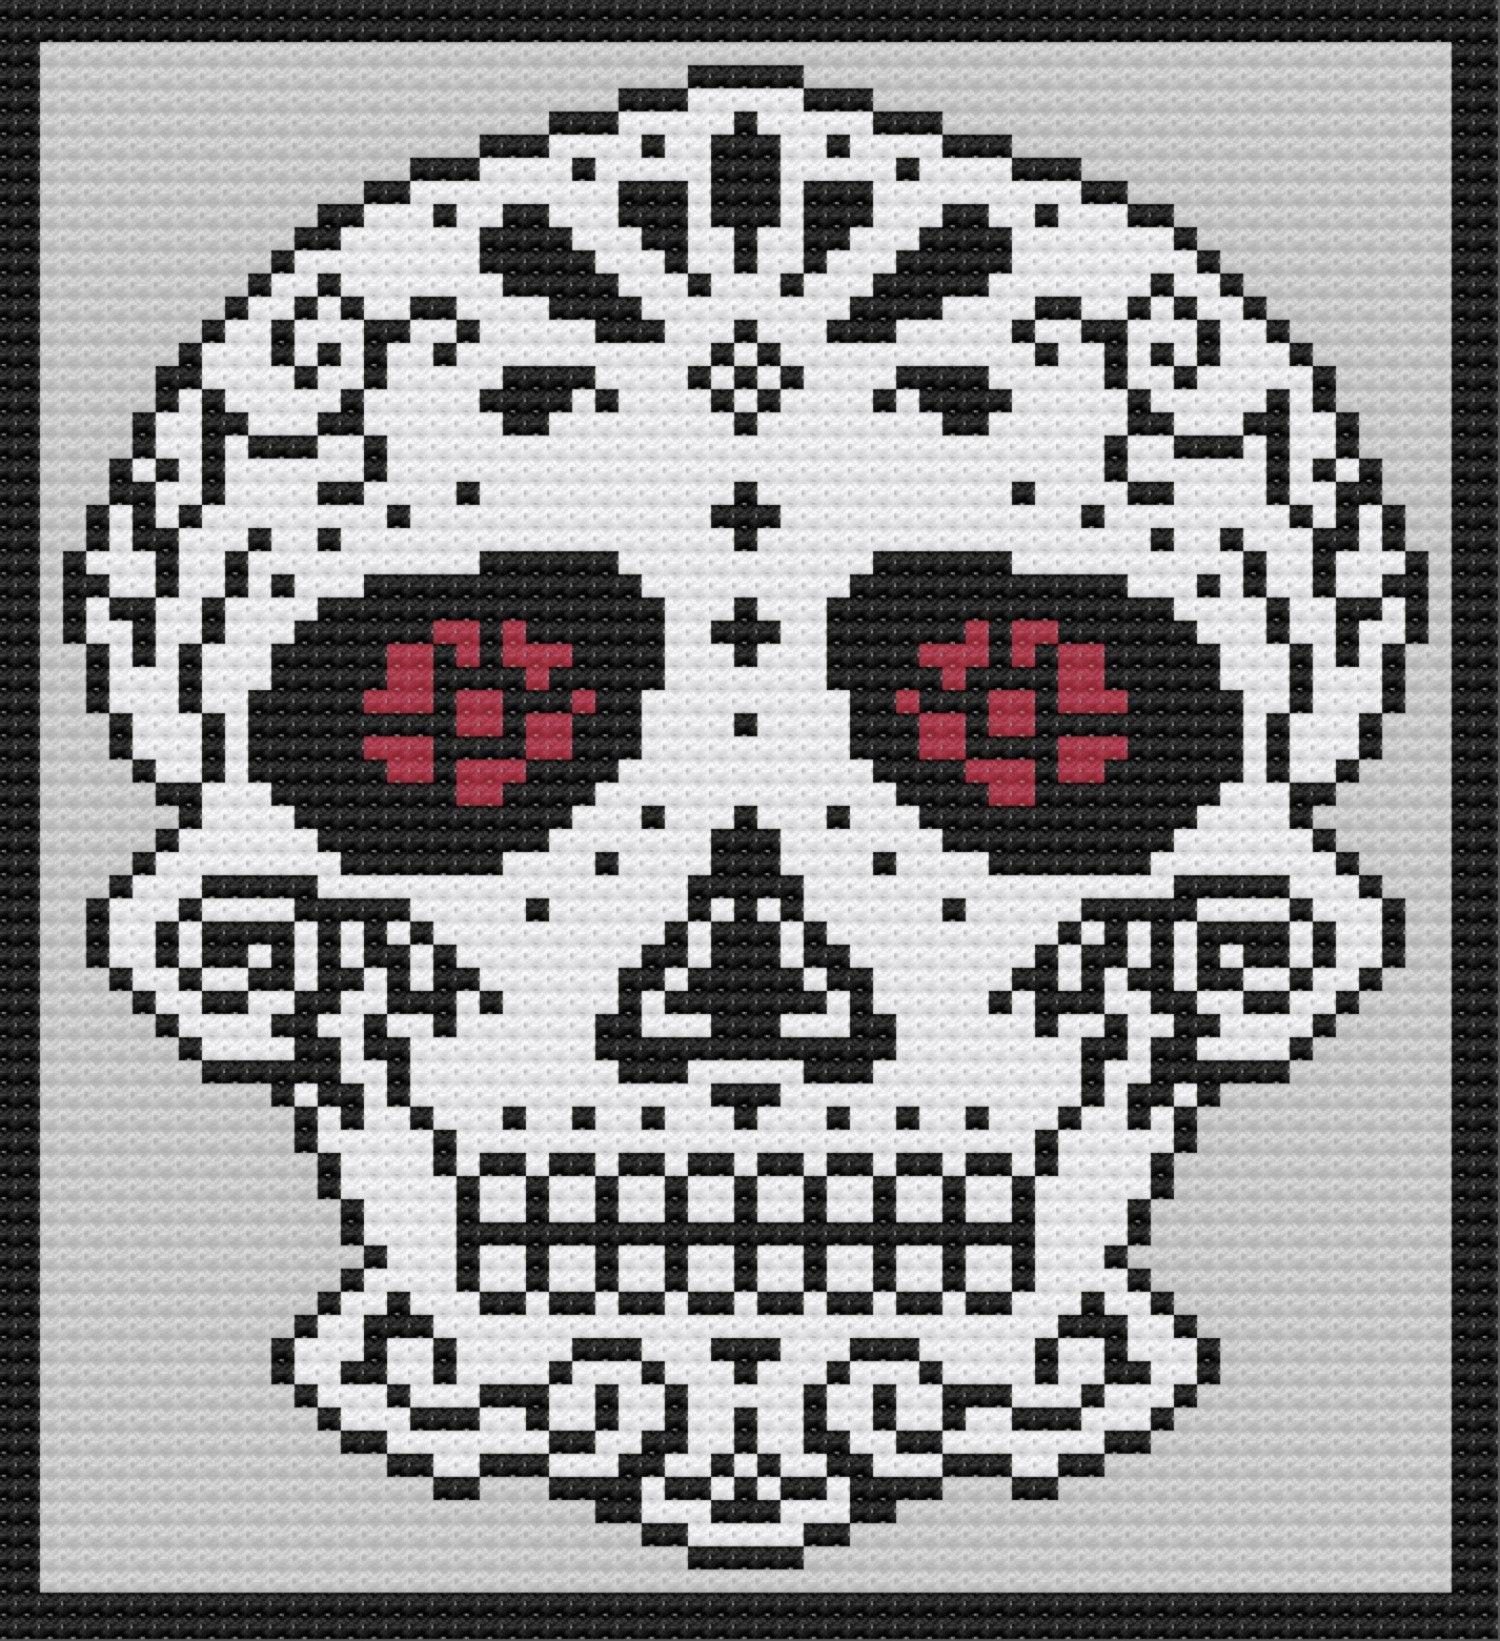 Sugar Skull Amigurumi Free Crochet Pattern • Spin a Yarn Crochet | 1641x1500